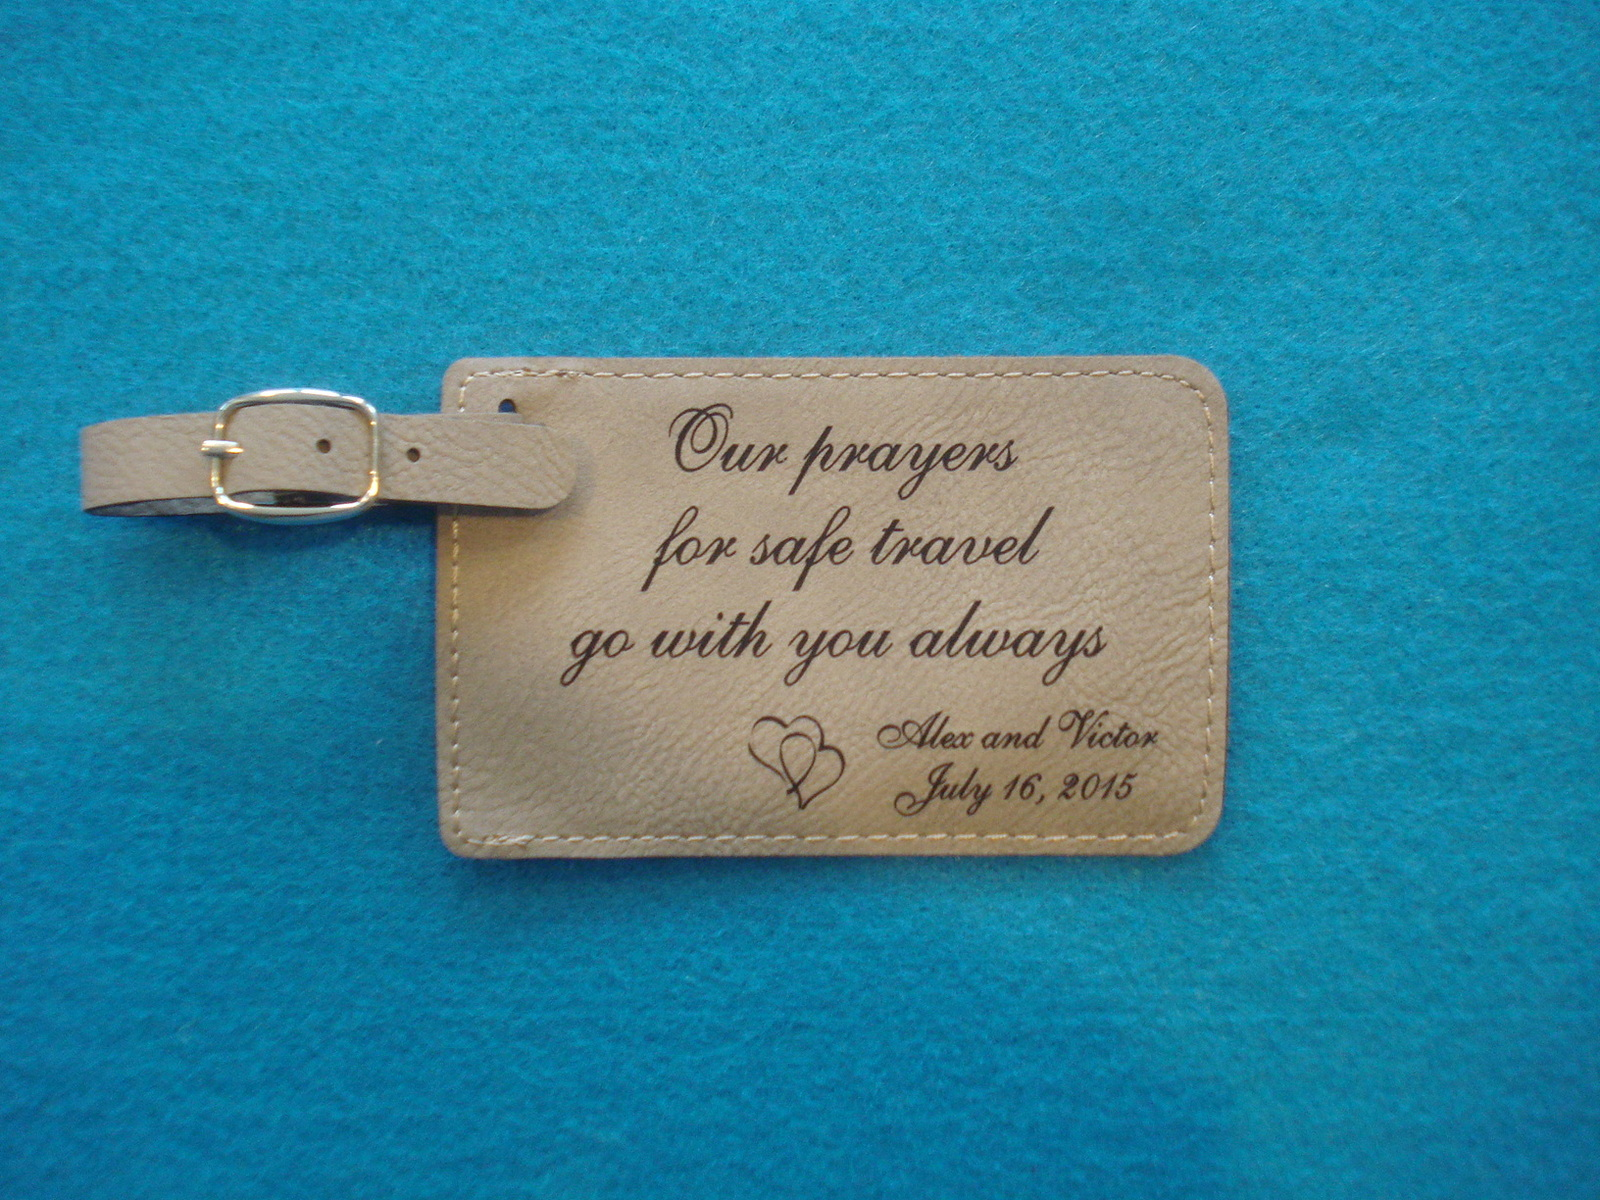 Personalized Luggage Tags Wedding Gift: 100 Custom WEDDING FAVORS